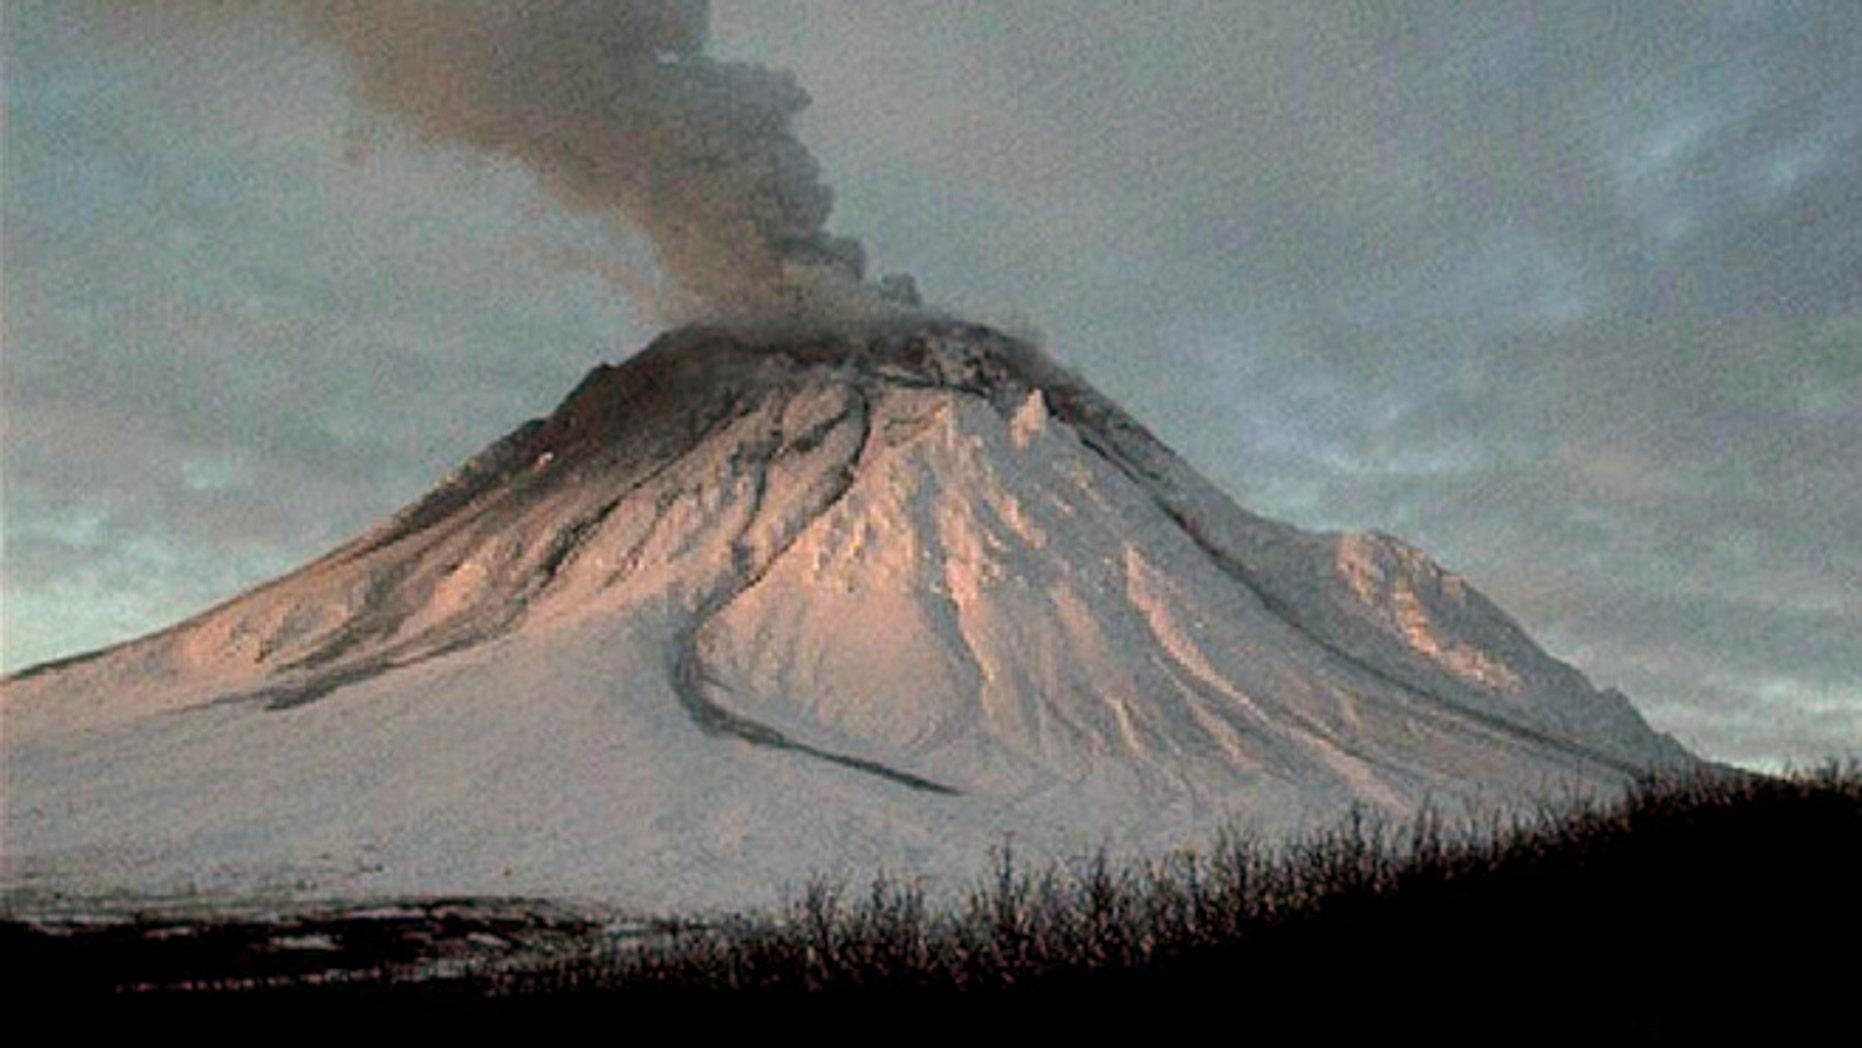 Jan. 12, 2006: The Alaska Volcano Observatory's Augustine Island webcam shows steam rising from Augustine Volcano 75 miles southwest of Homer, Alaska.